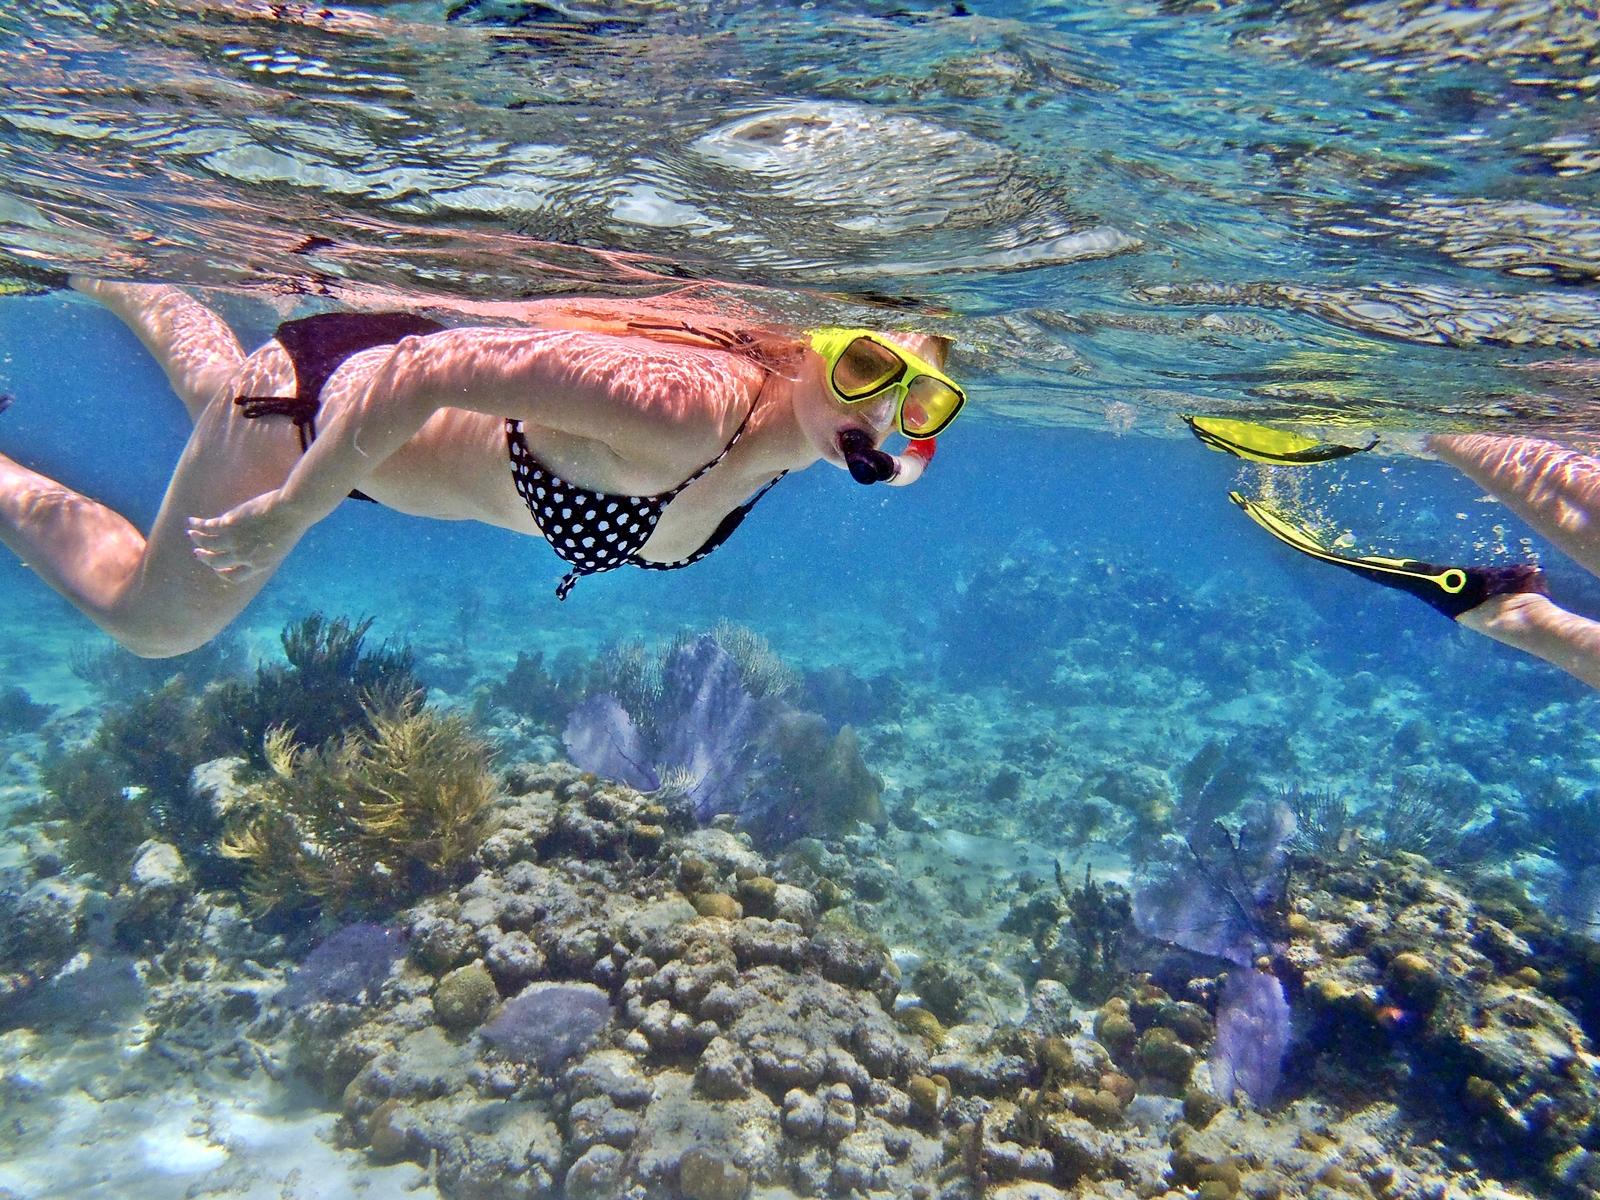 Snorkeling in Catalina Island